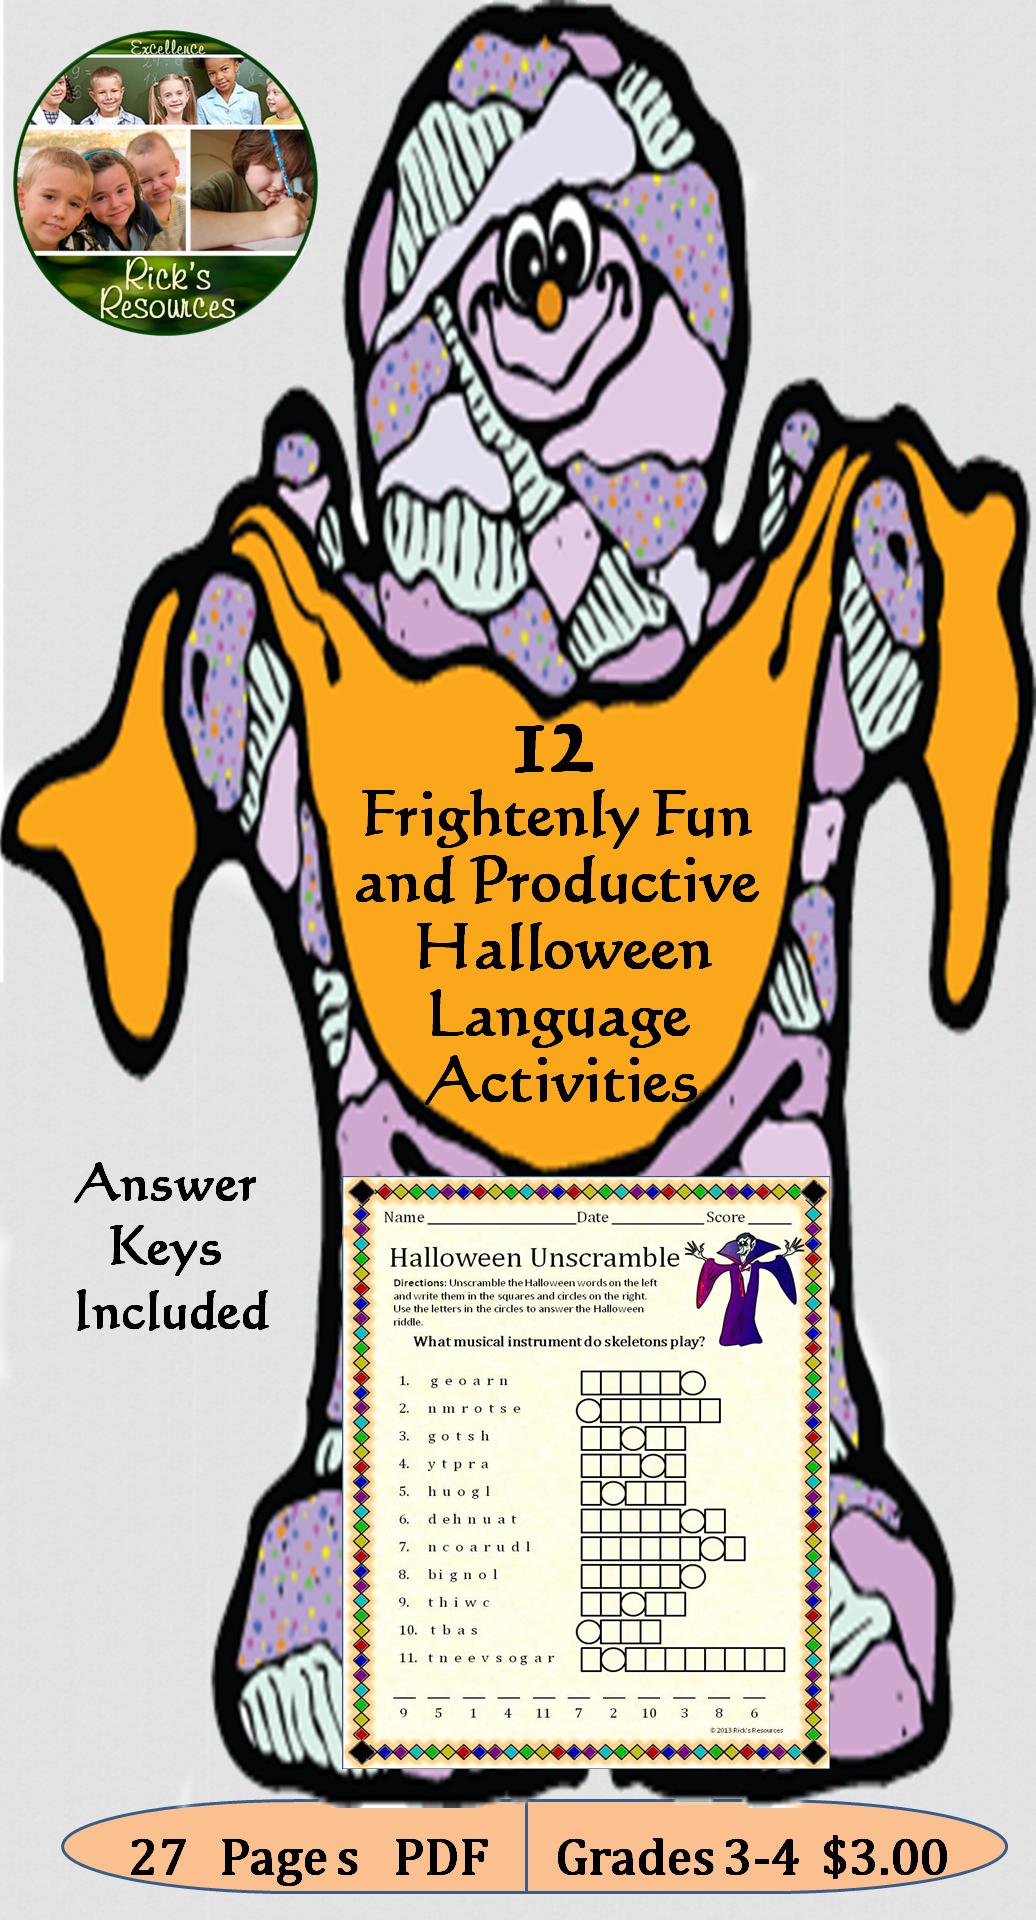 Halloween Language Activities With Images